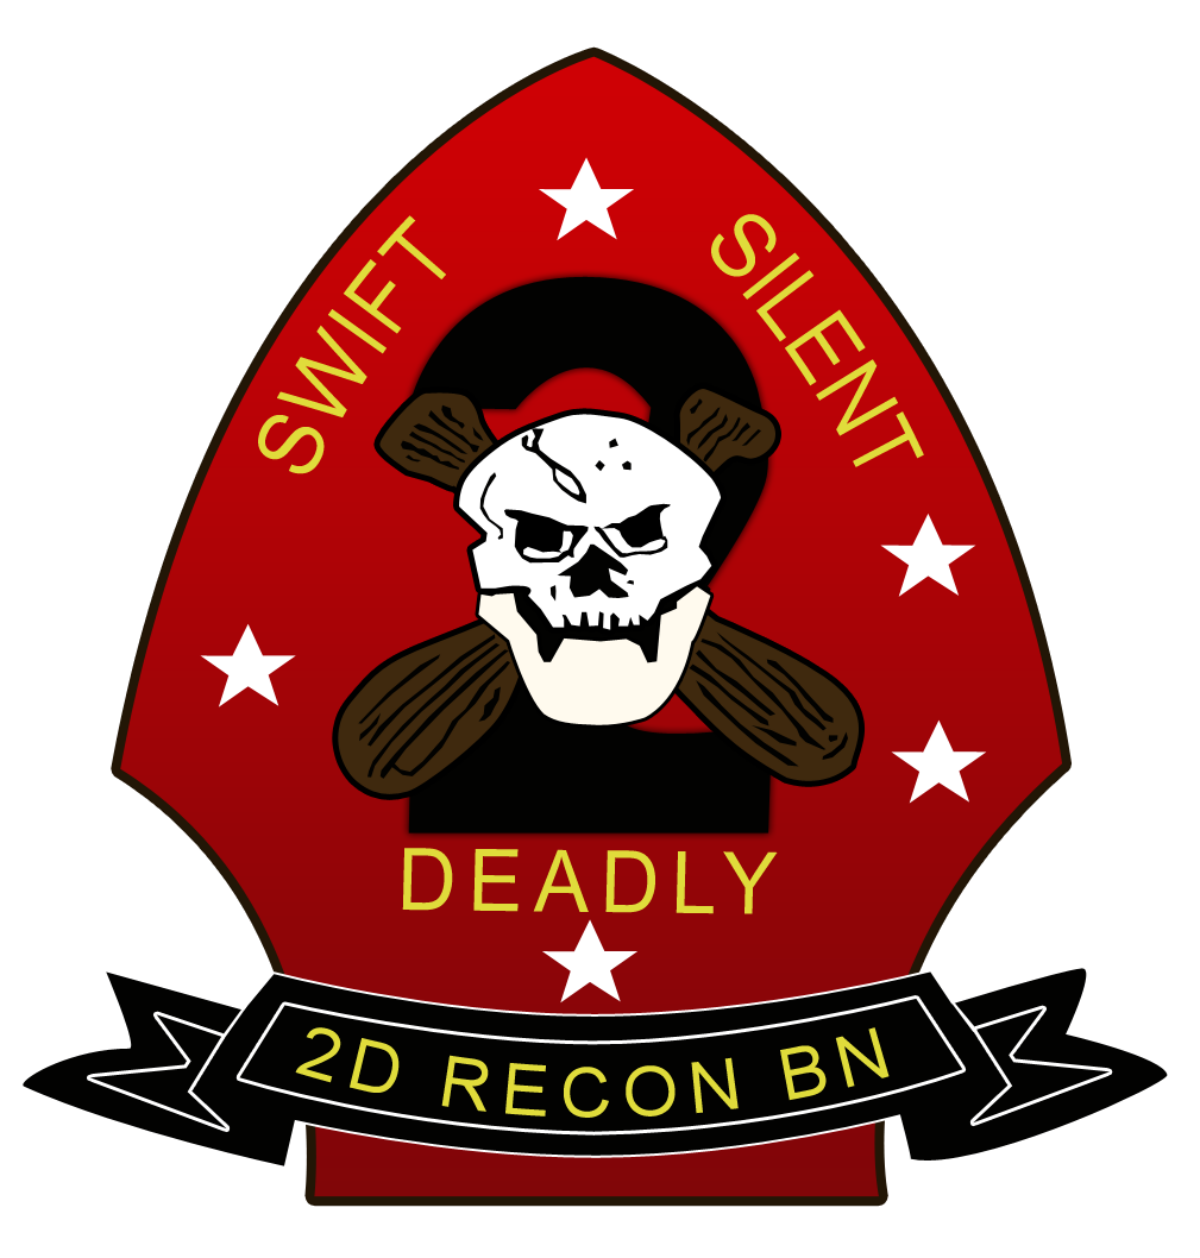 1200x1258 2nd Reconnaissance Battalion (United States Marine Corps)